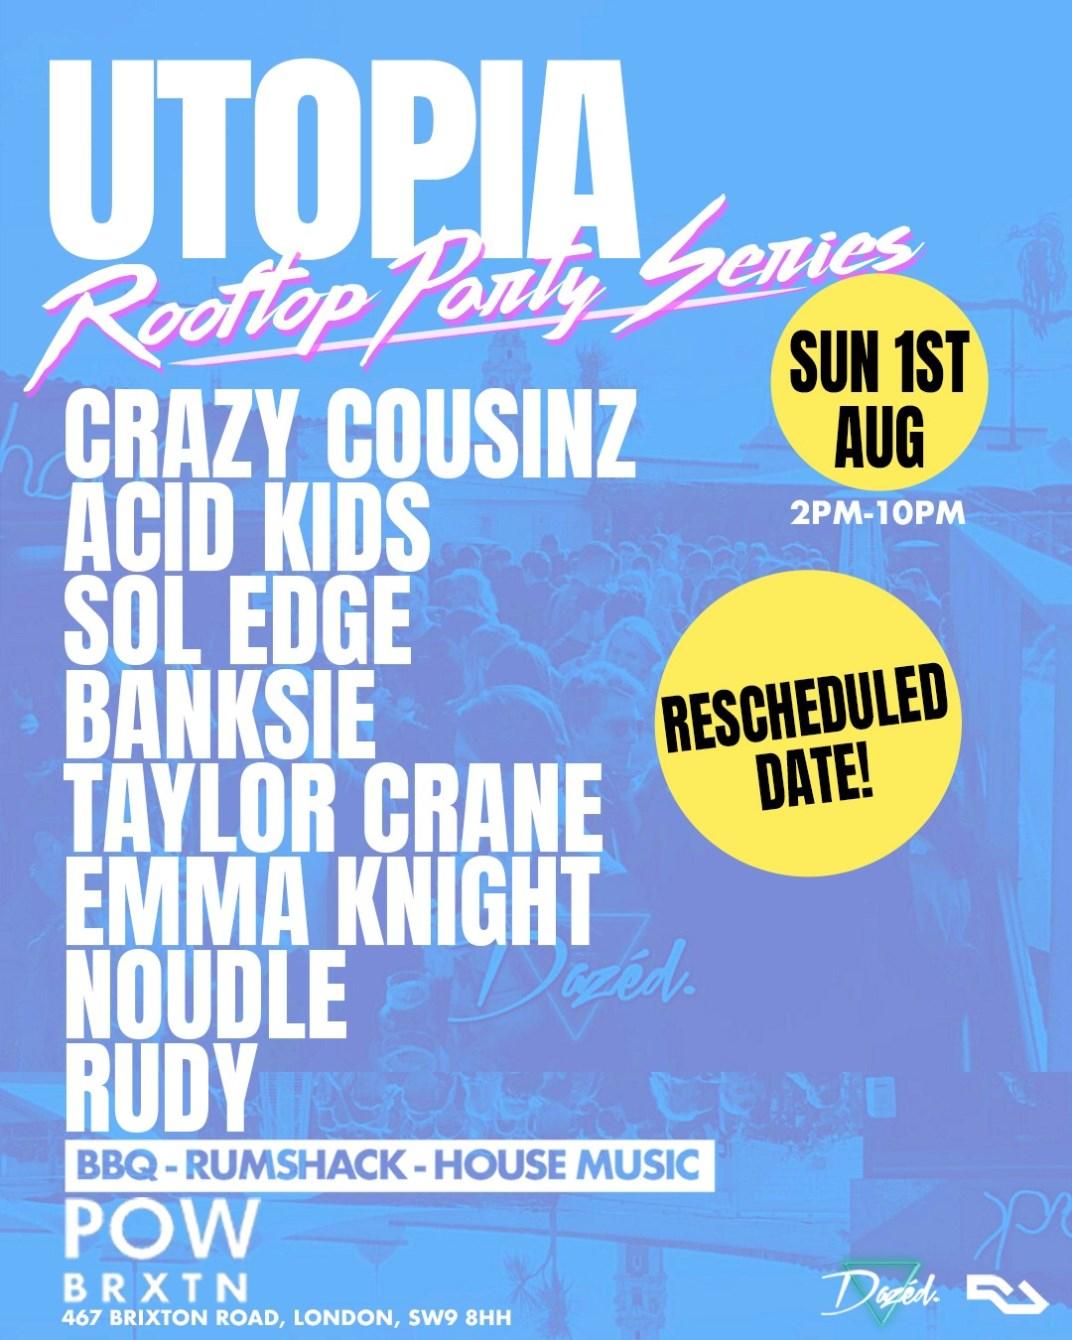 Utopia: Summer Rooftop Party - Flyer front